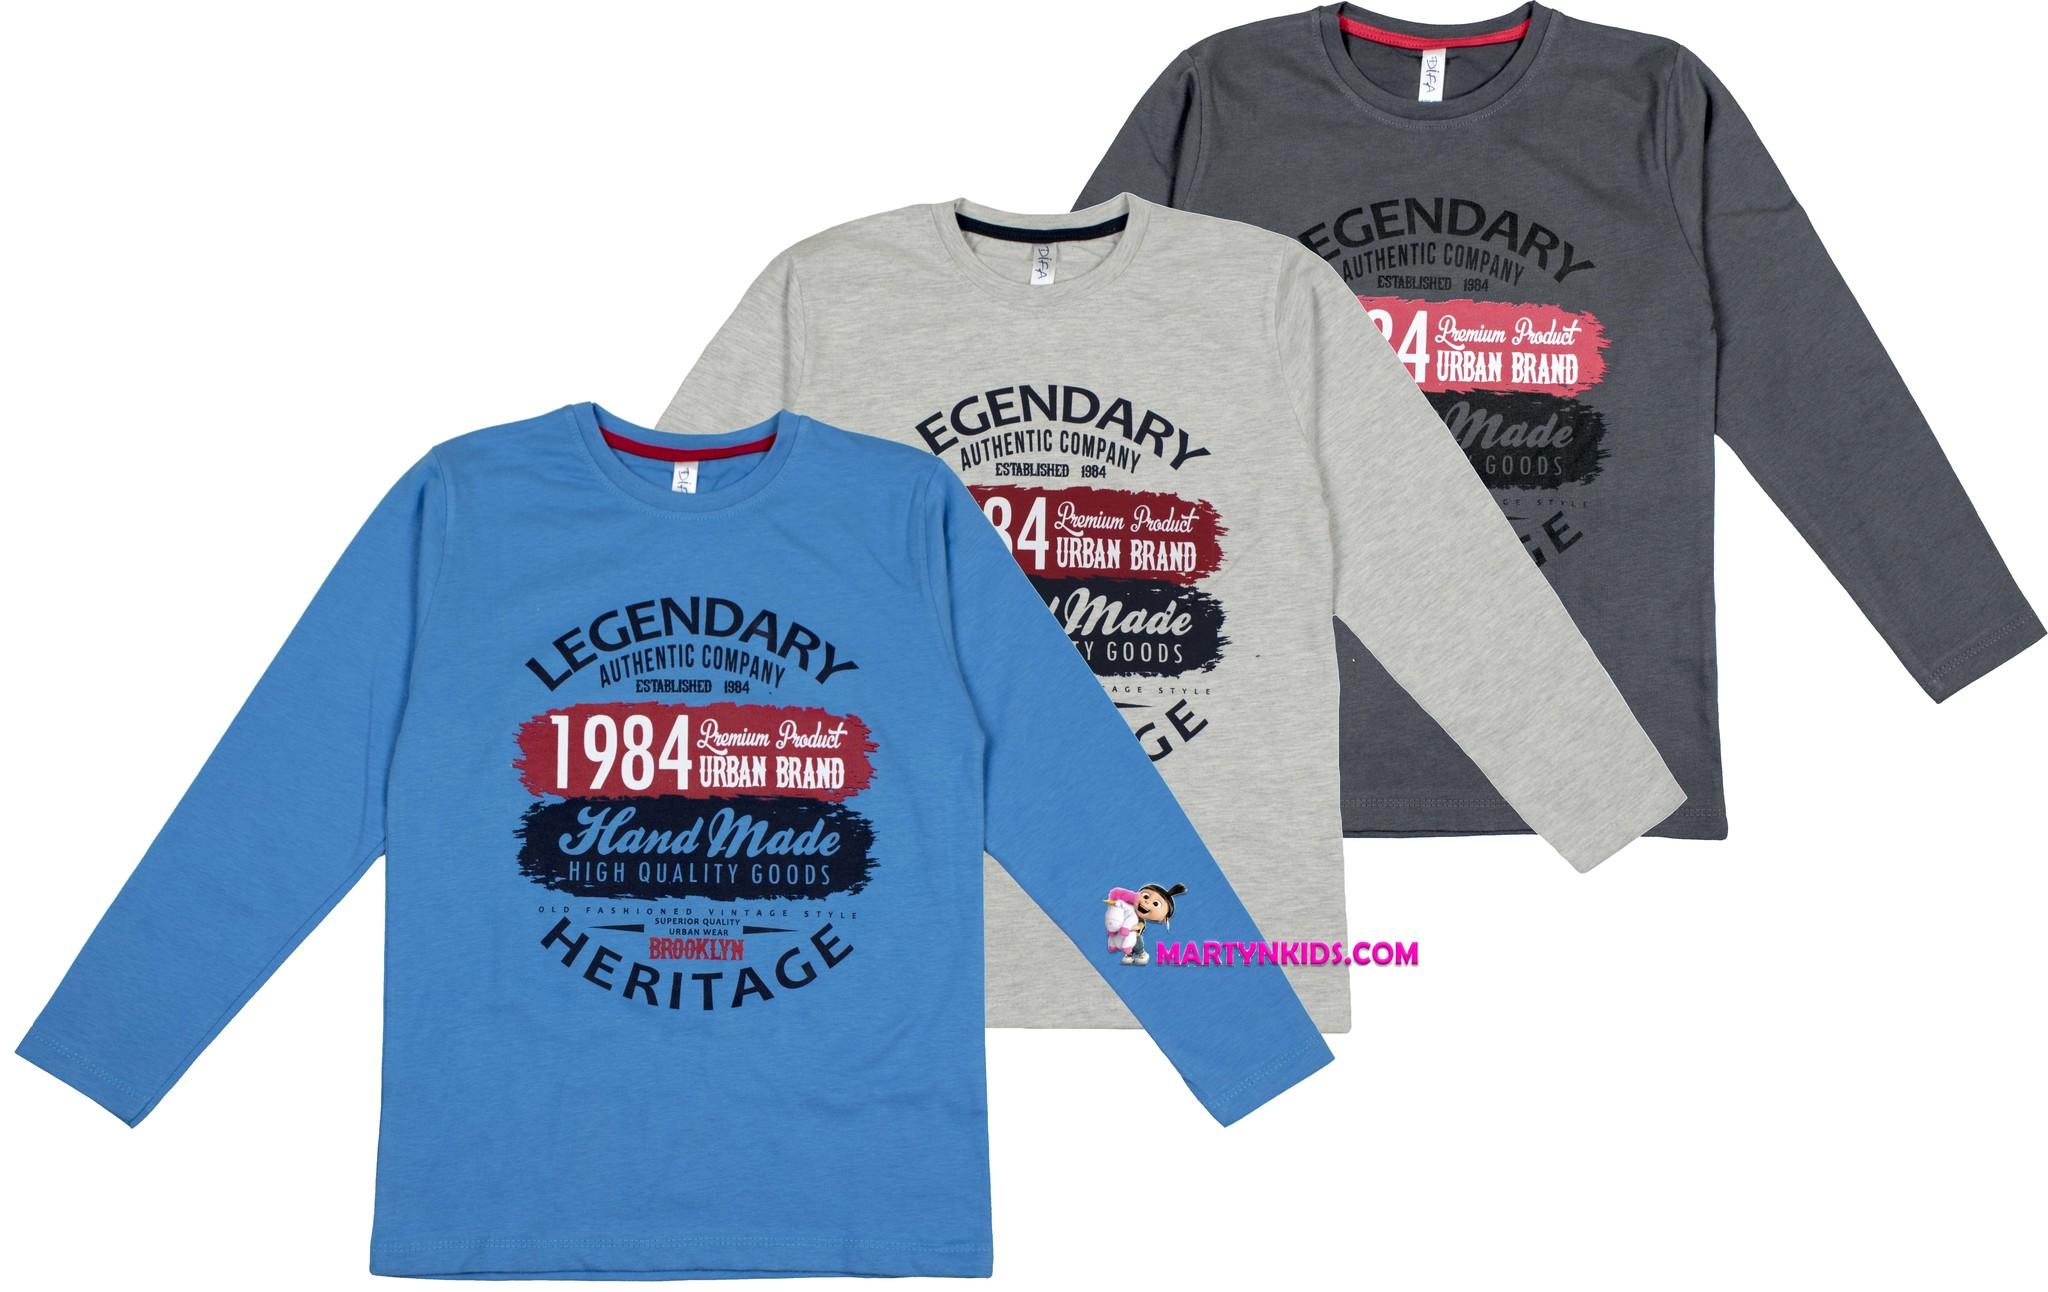 2002 лонгслив Легенда 1984